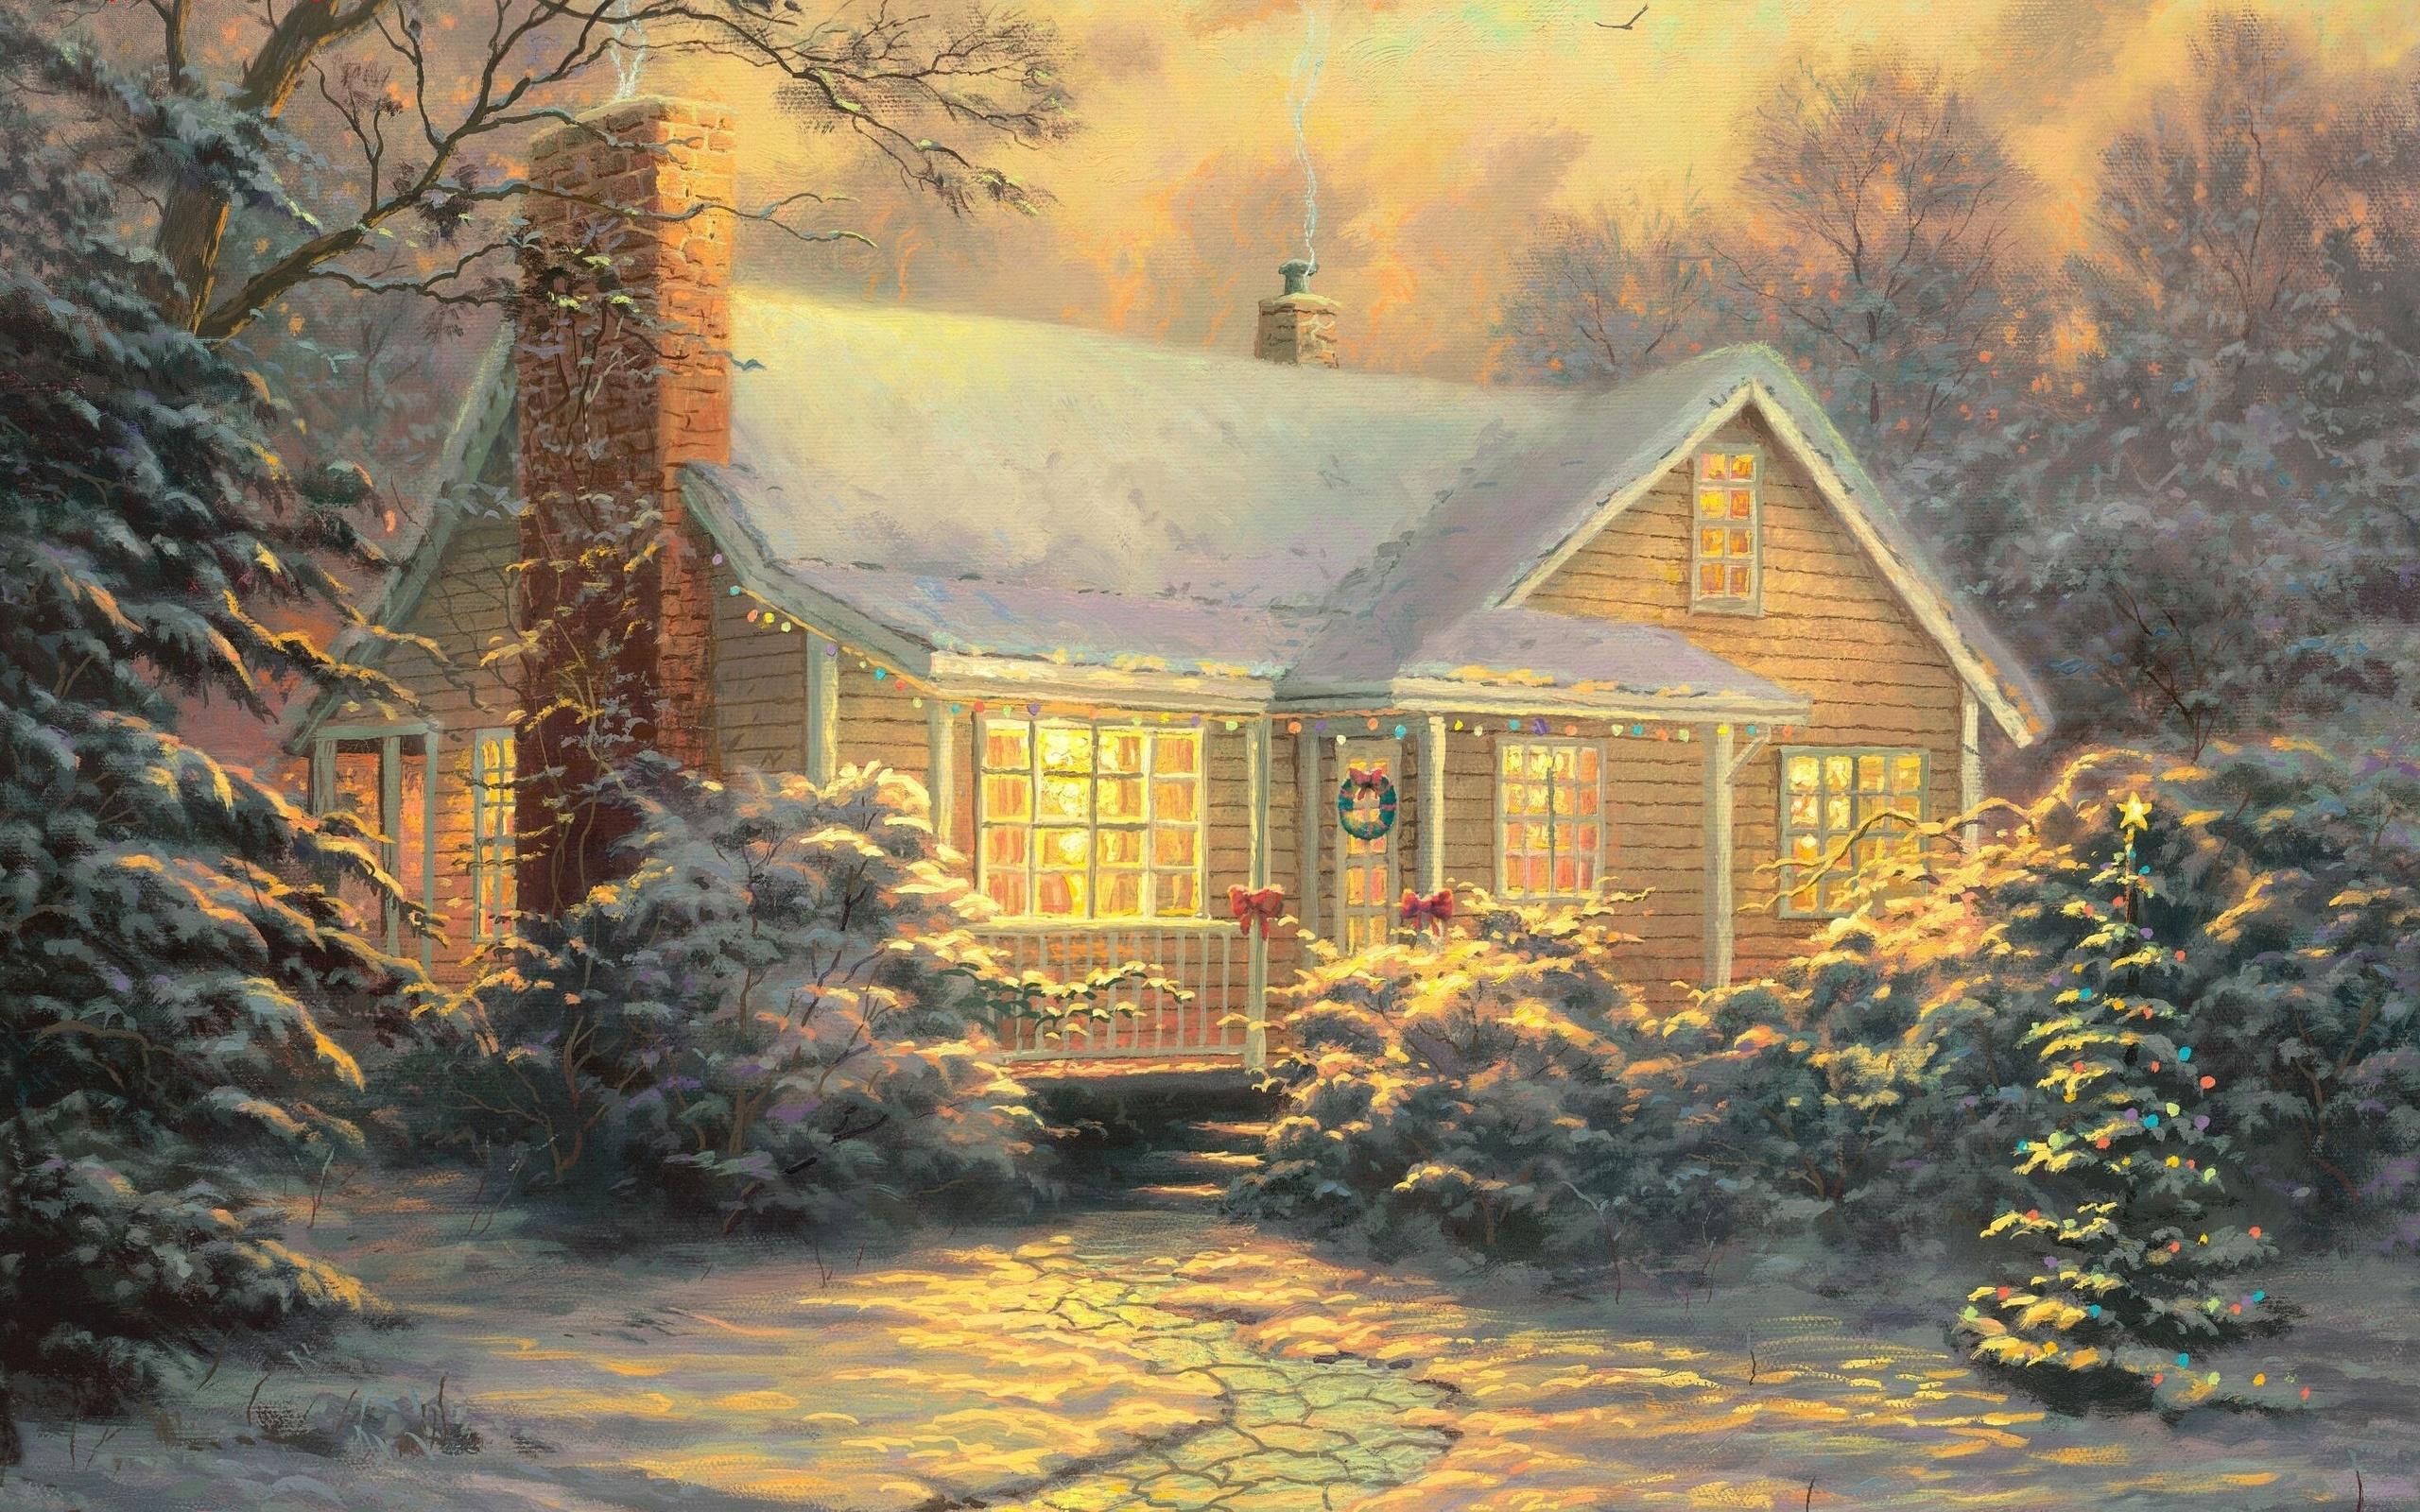 Новогодние домики томас кинкейд картинки